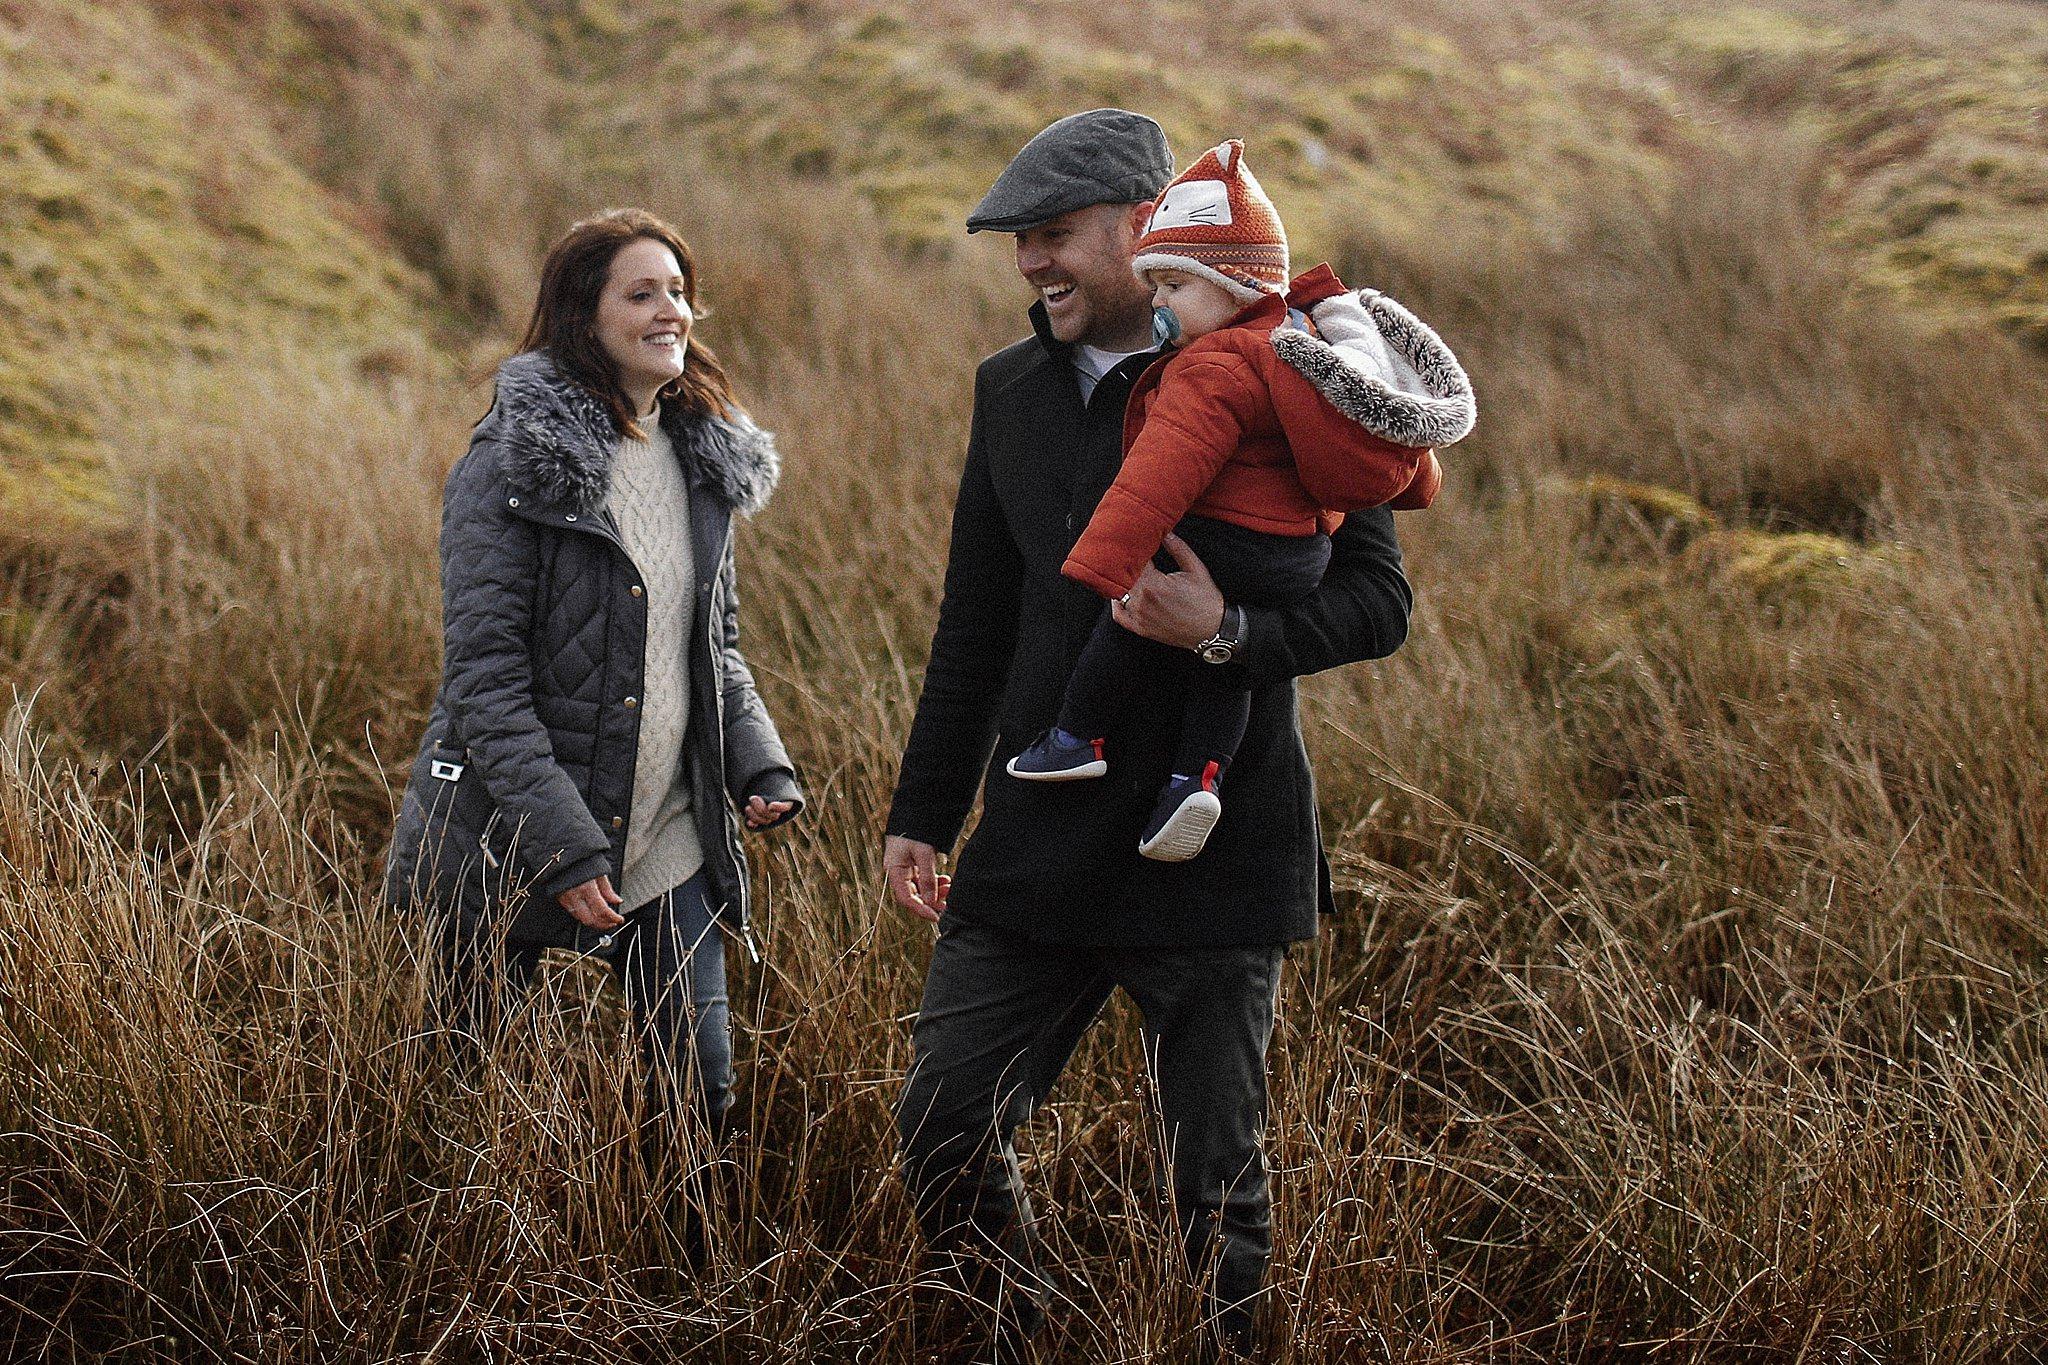 Sheffield_Family_Photography_0007.jpg